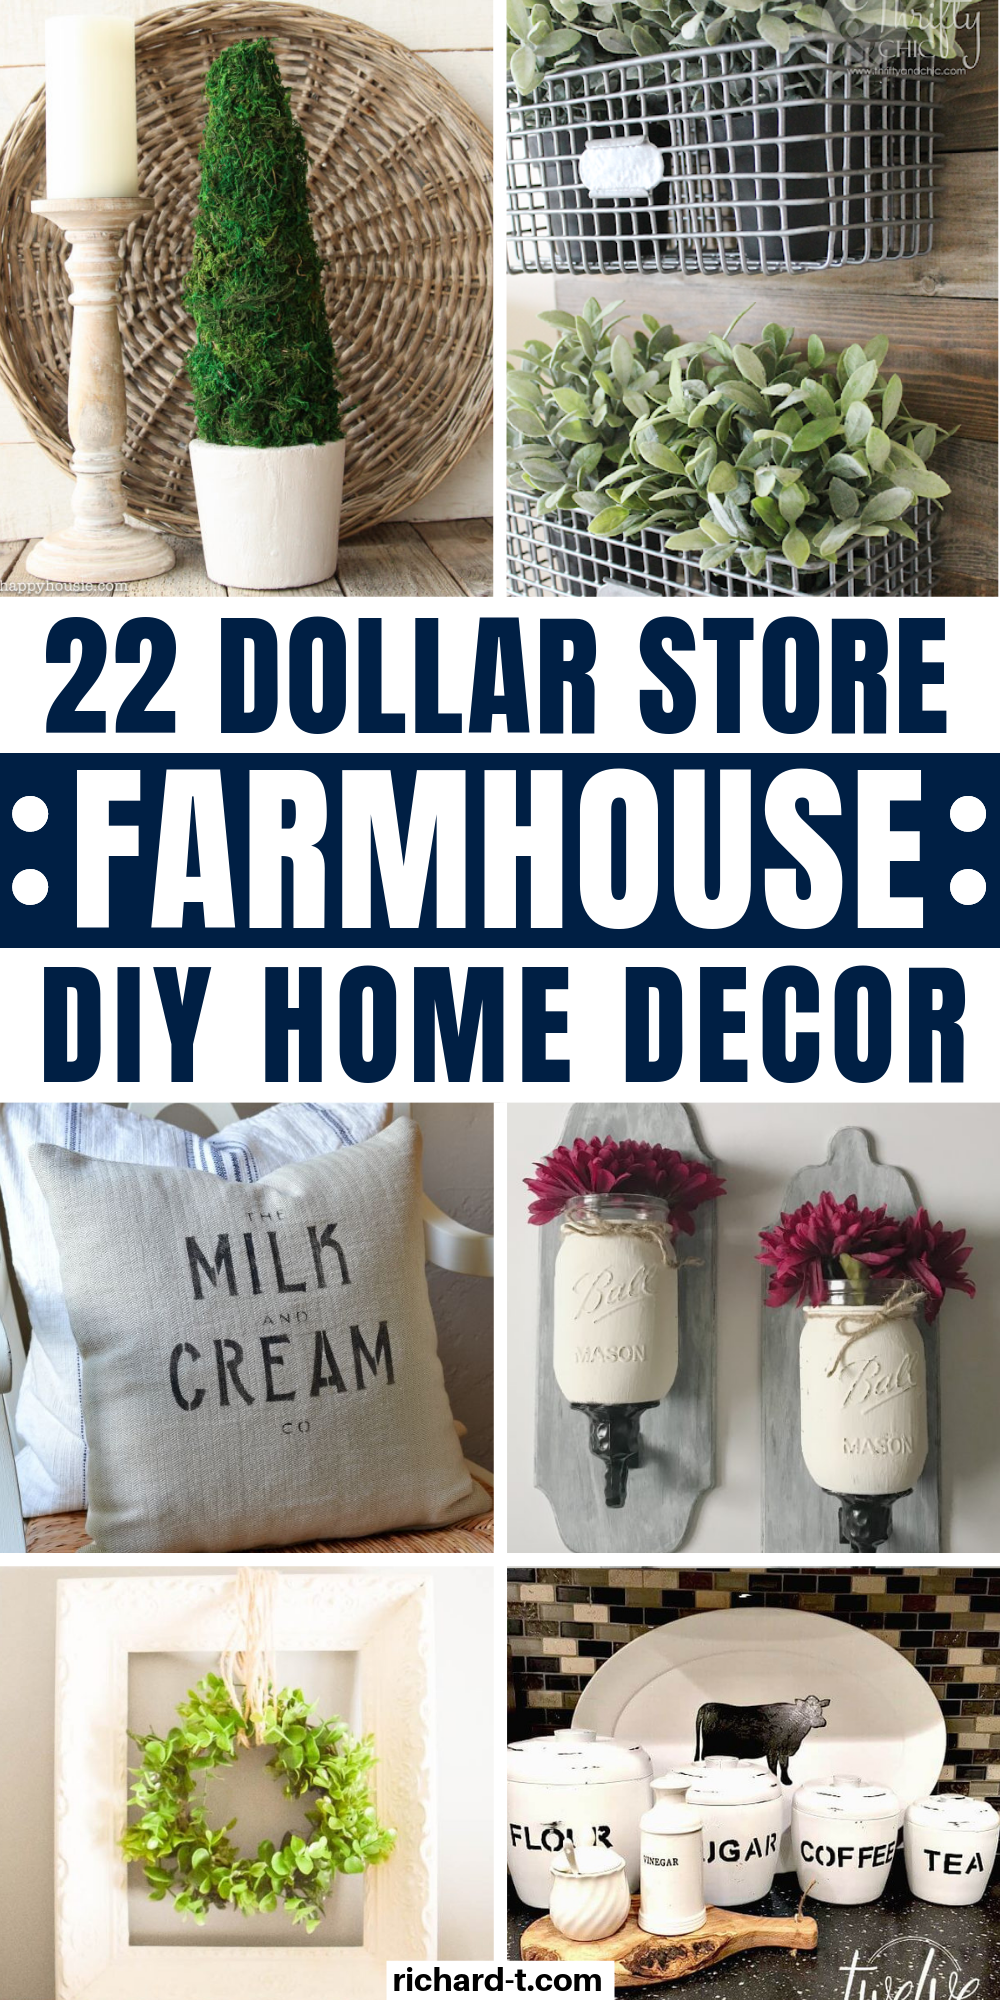 22 Amazing Dollar Store DIY Farmhouse Decor Ideas